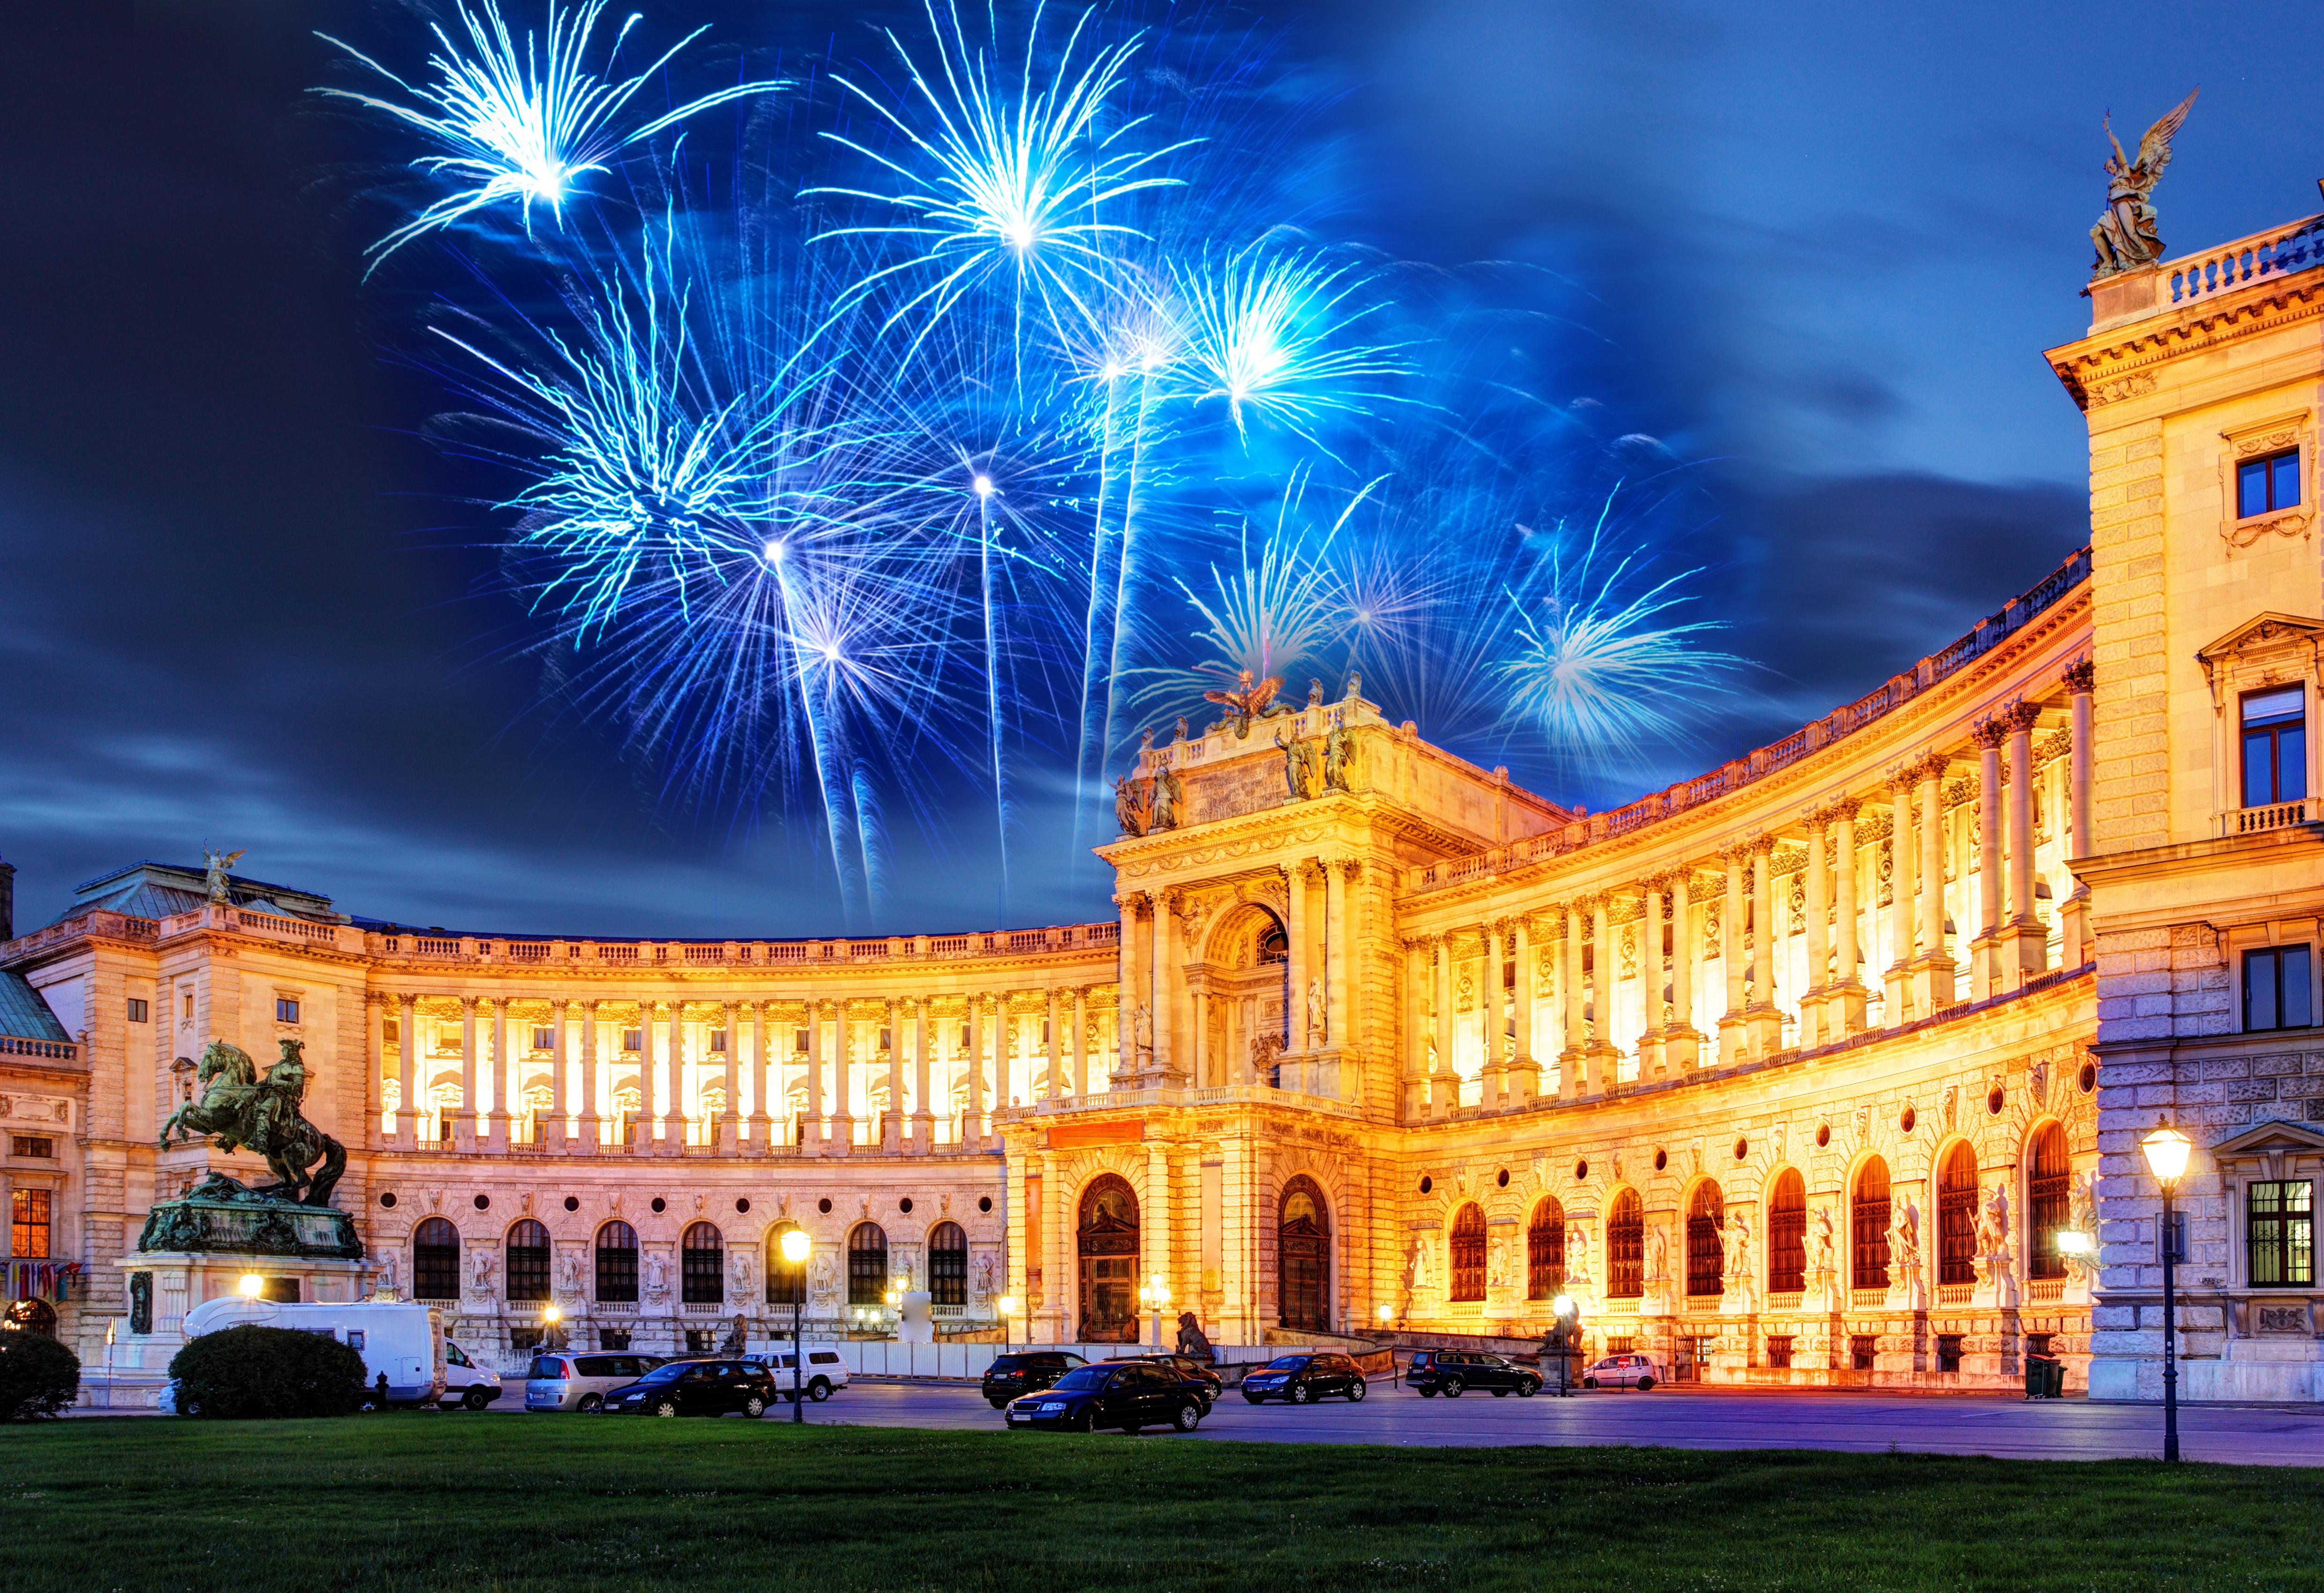 https://assets.eberhardt-travel.de/2018/Oesterreich/63153_Hofburg_in_Wien_-_Silvester_Original.jpg